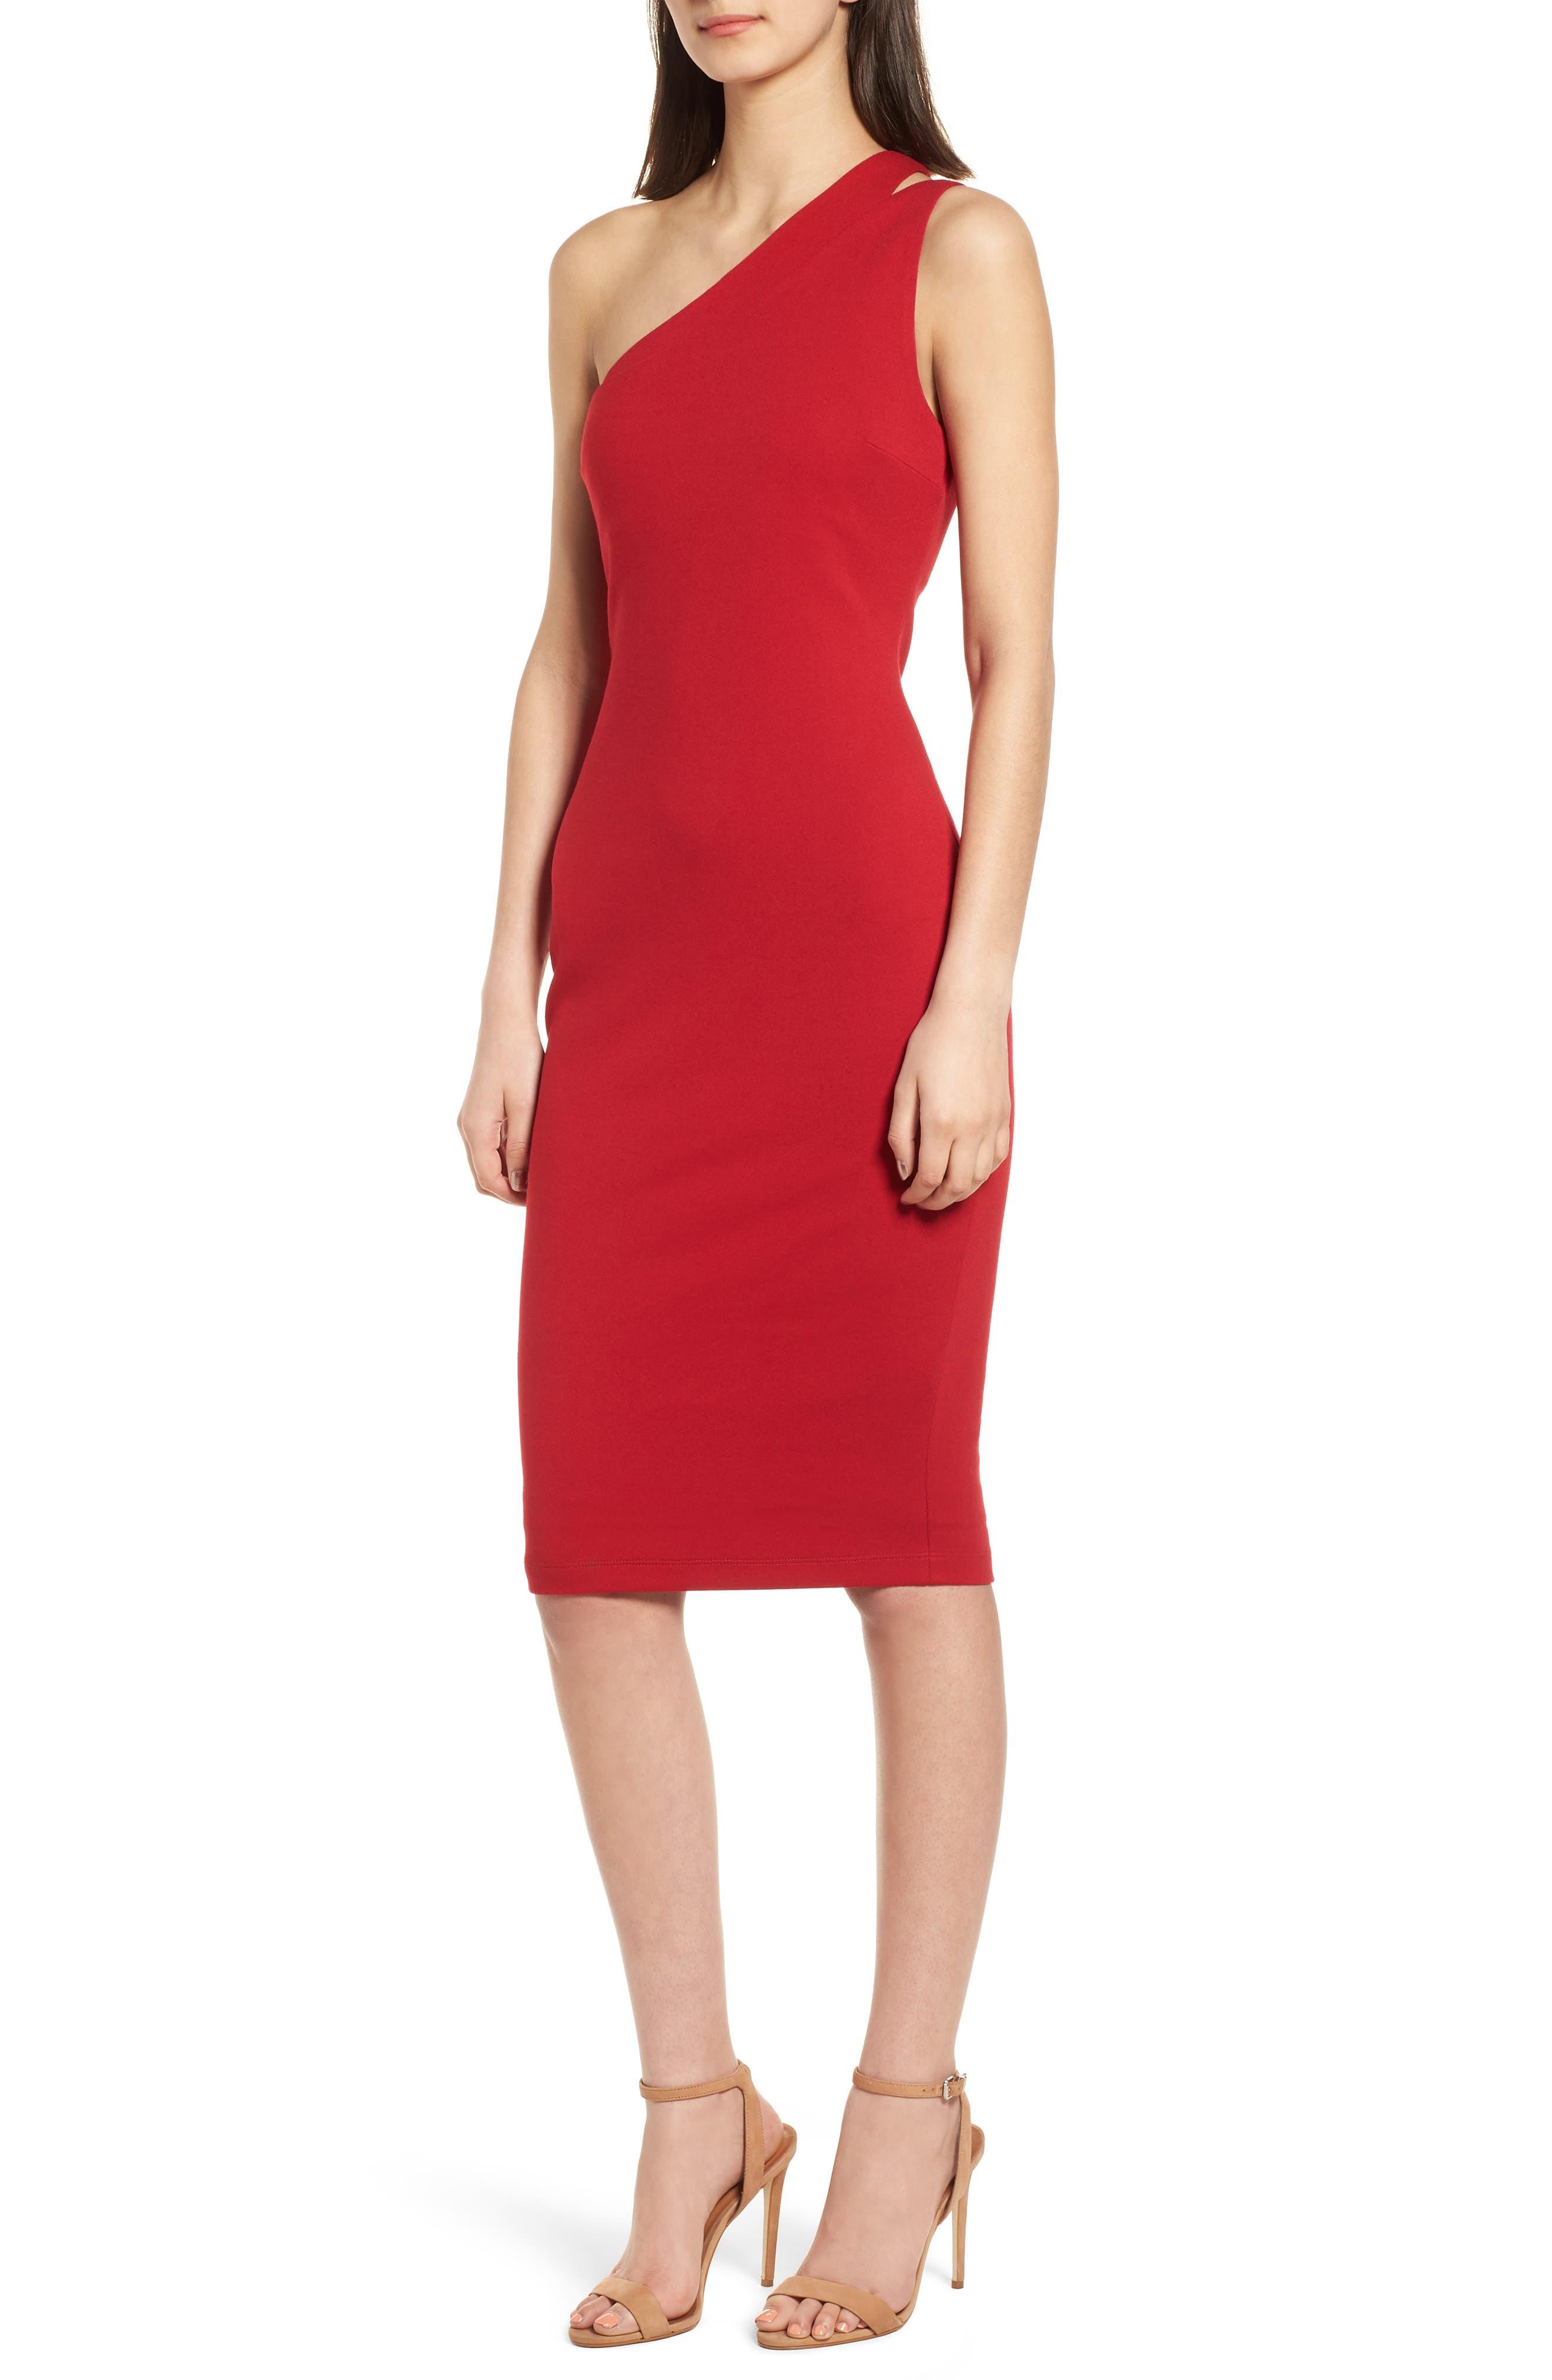 Sidewinder One-Shoulder Body-Con Dress,                         Main,                         color, 700